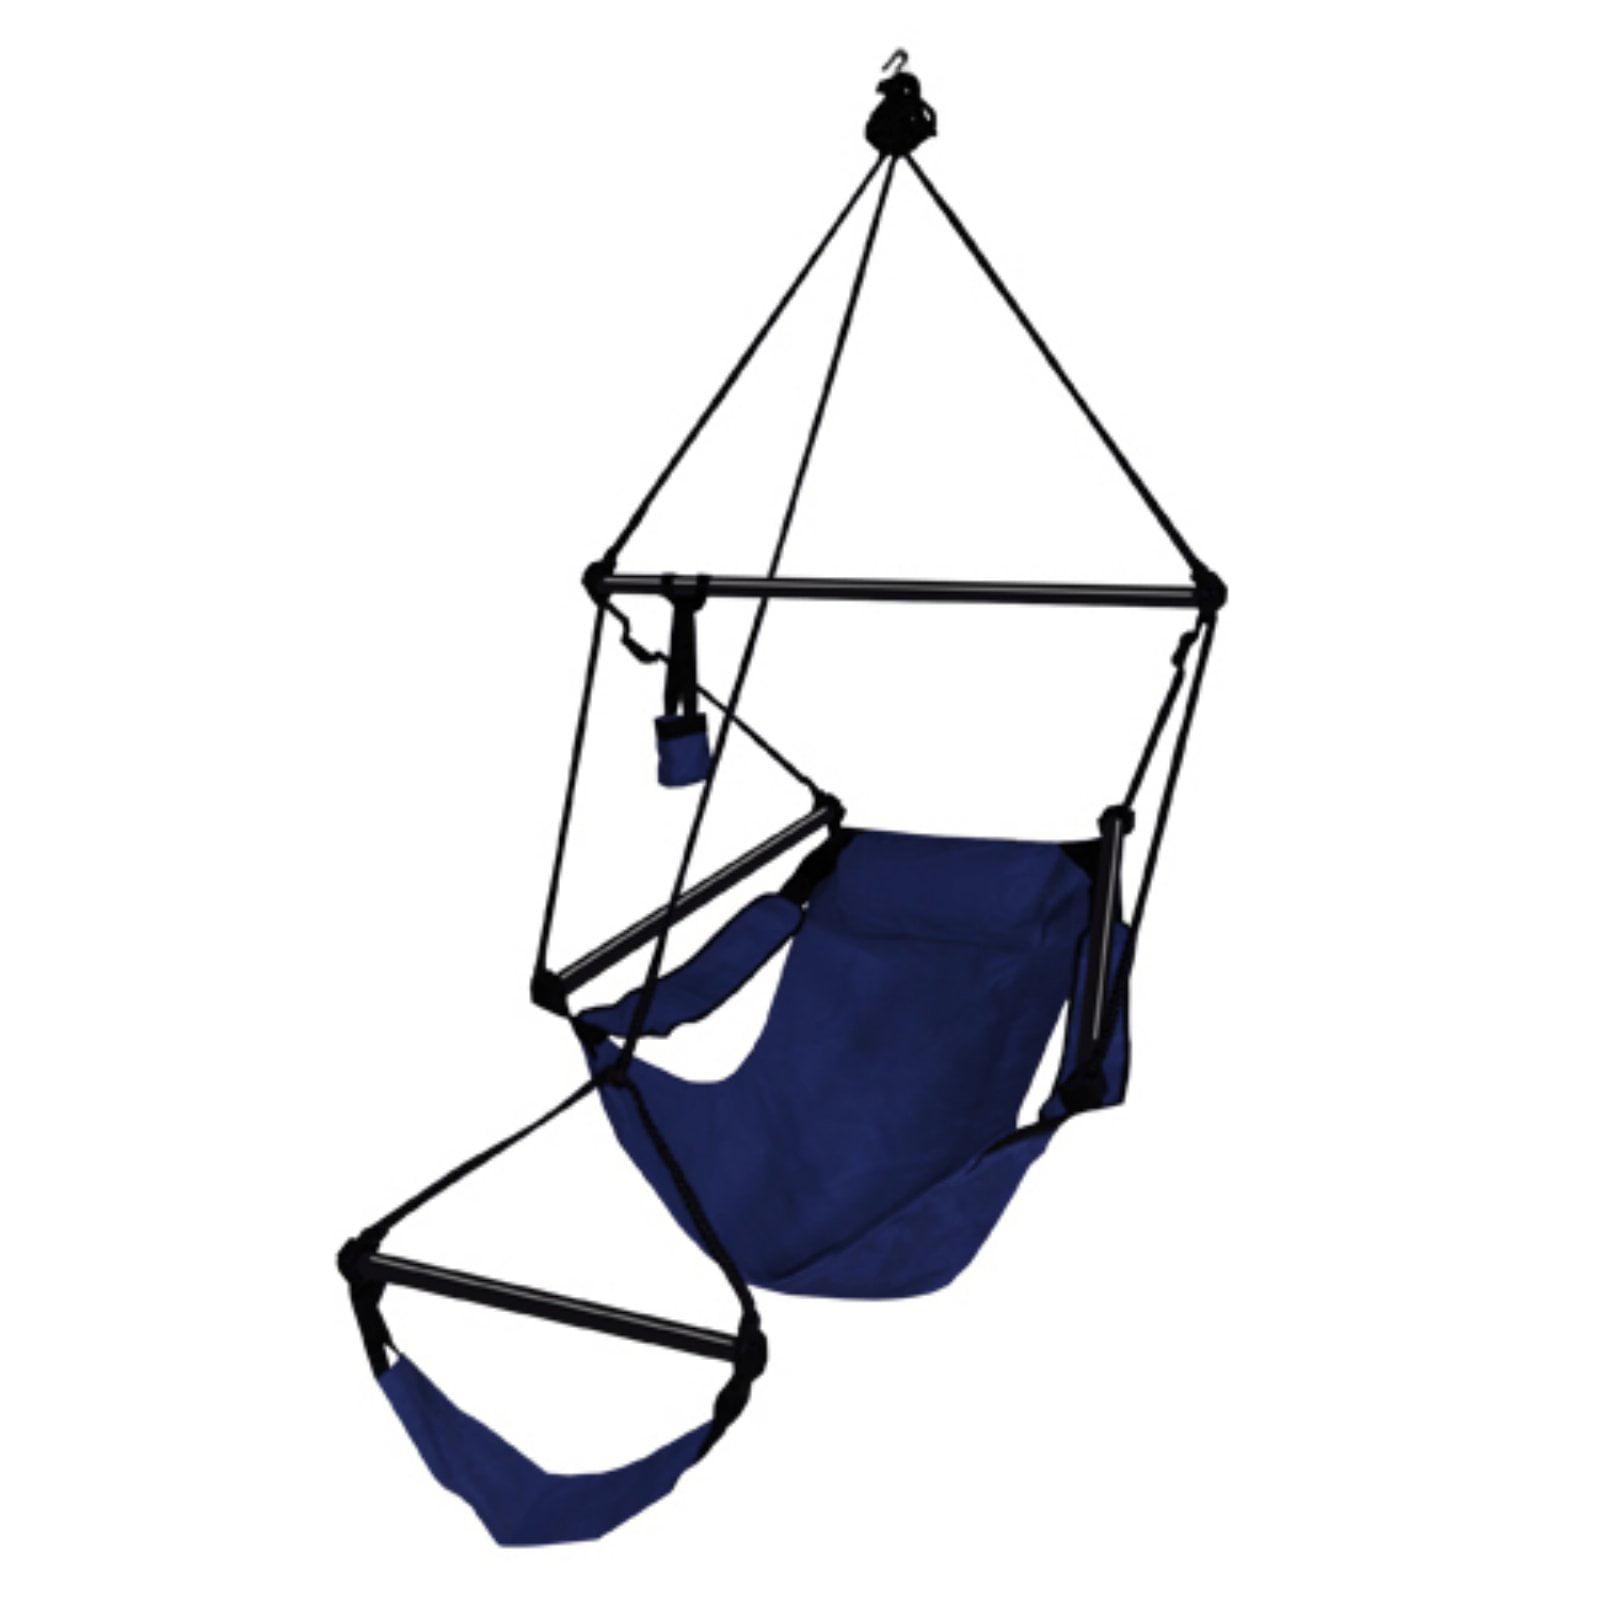 Hammaka Hammocks Original All-Weather Hanging Air Chair